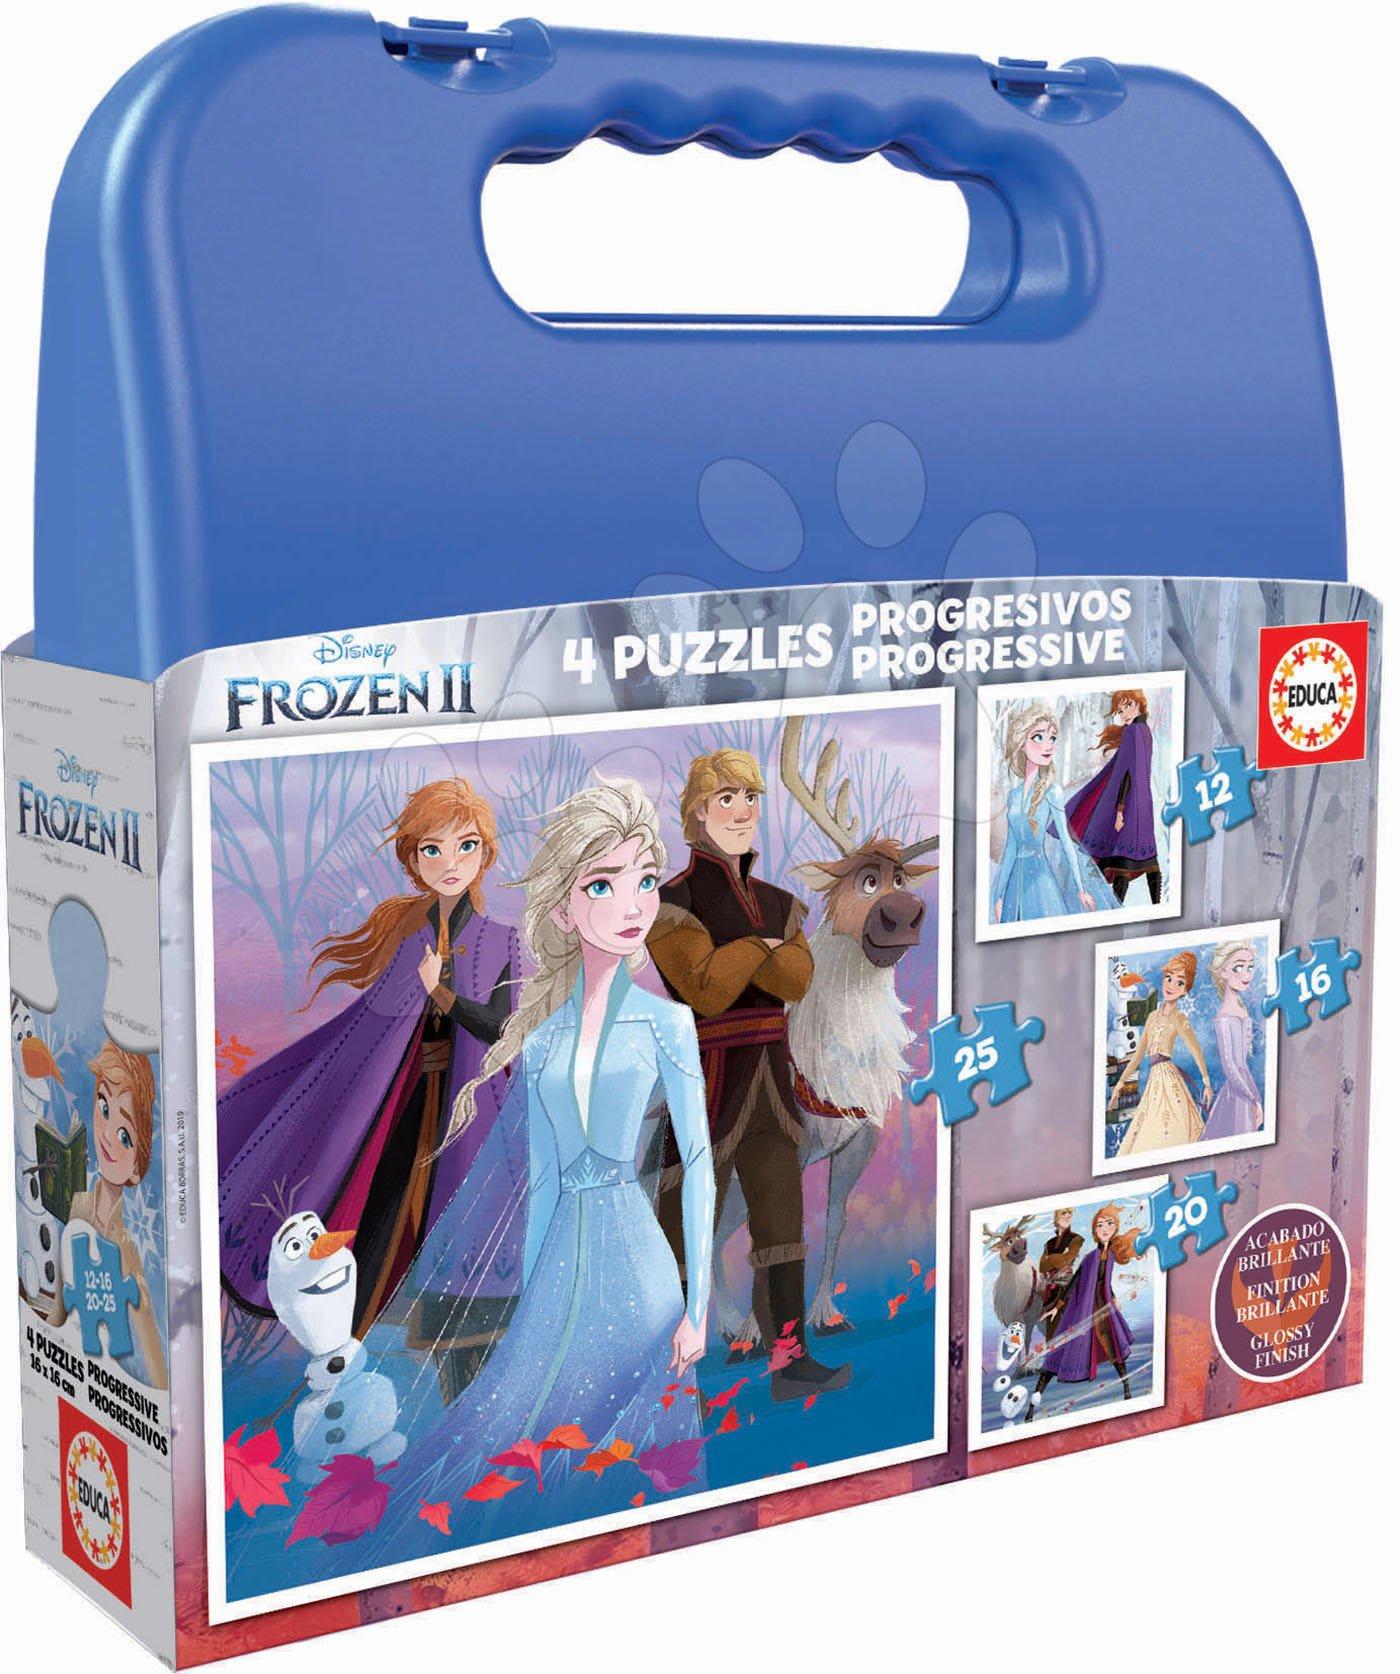 Detské puzzle v kufríku Frozen 2 Case Educa 12-16-20-25 dielov od 4 rokov